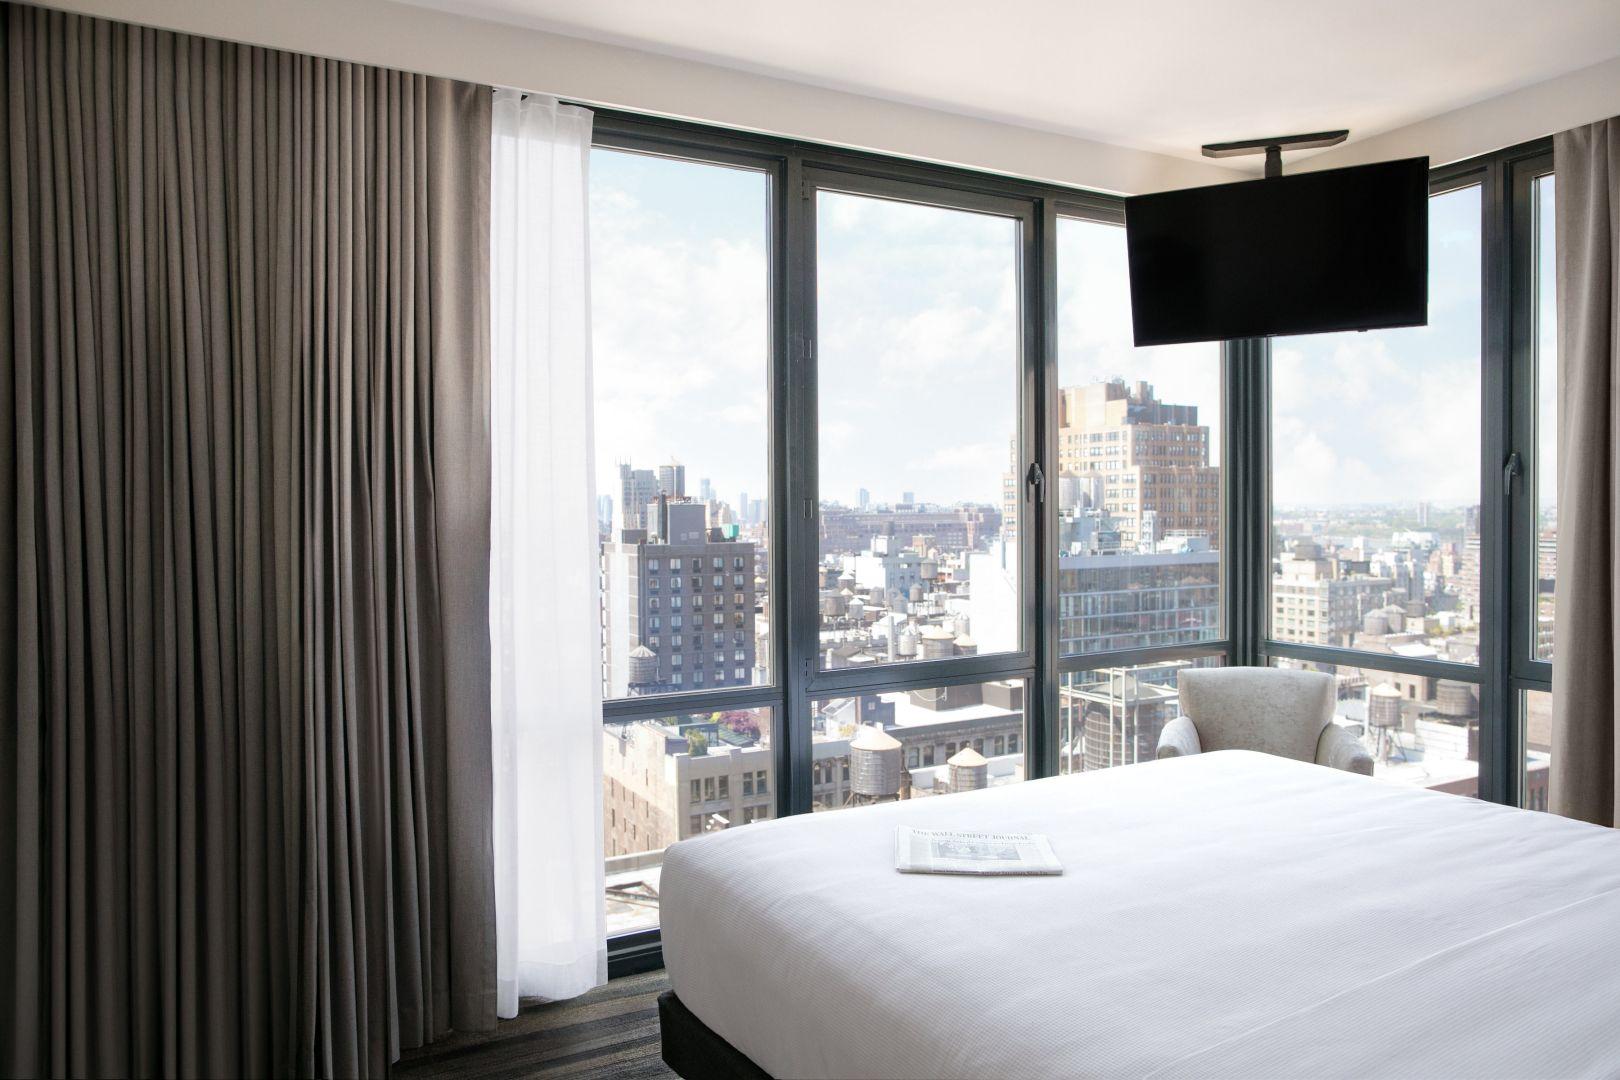 Hyatt House New York/Chelsea hotel room overlooking NYC